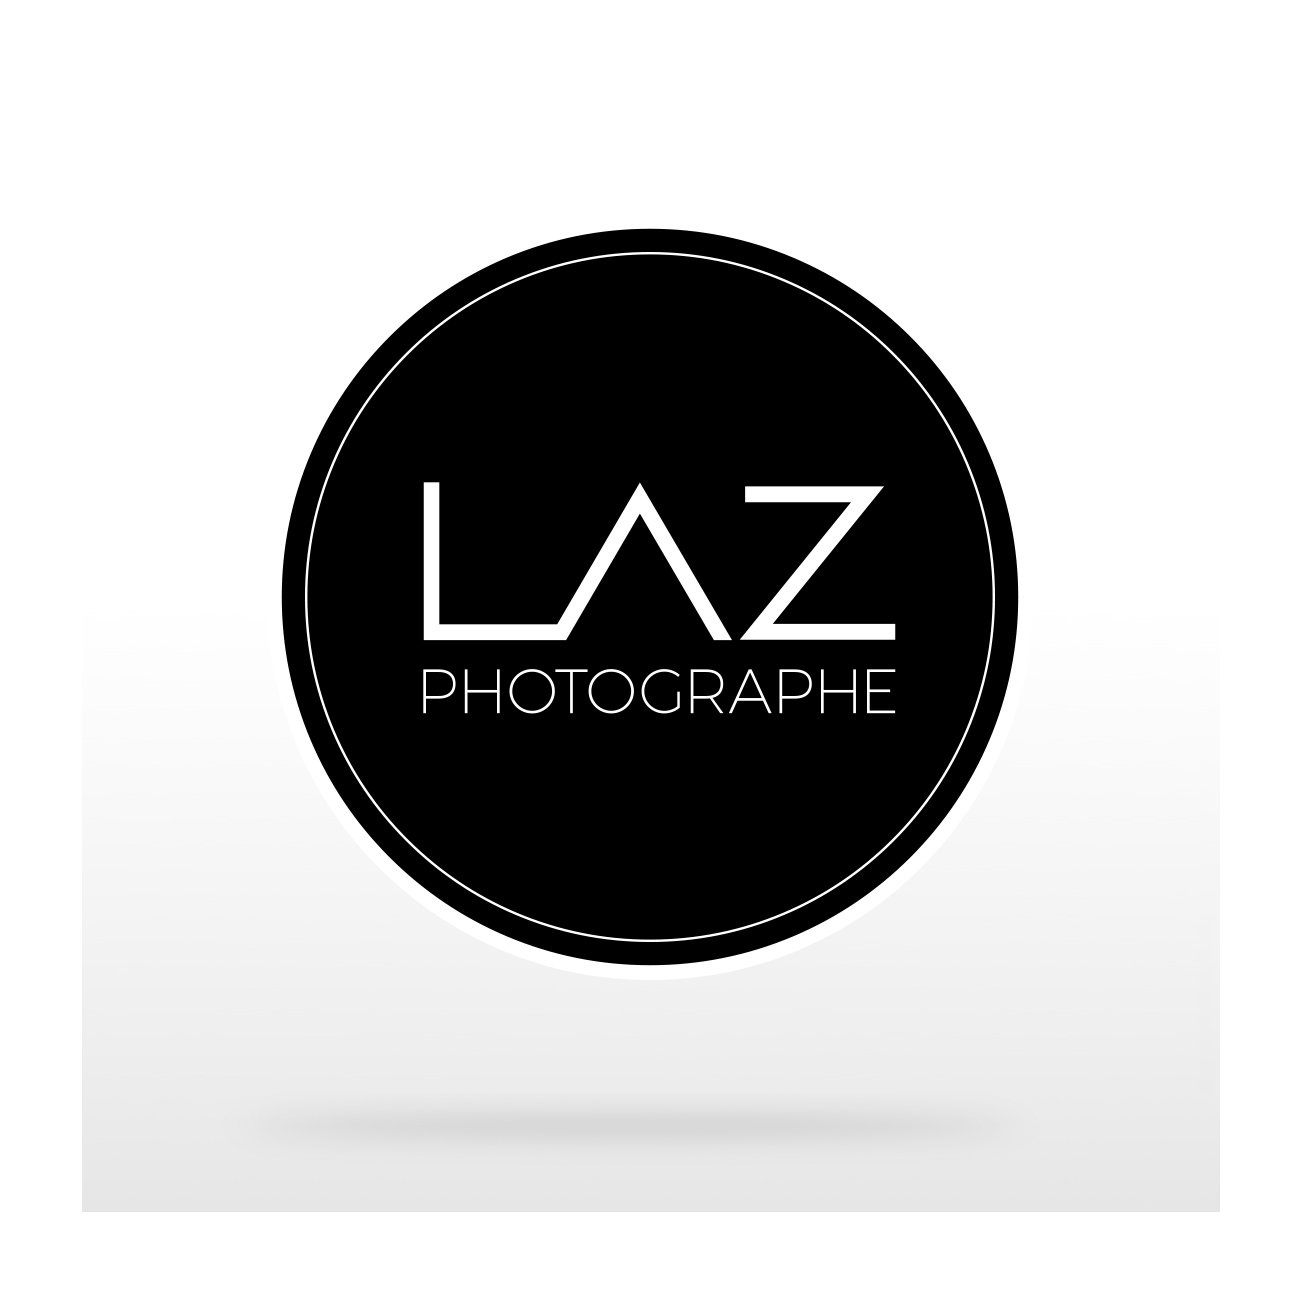 logos_laz_photographe